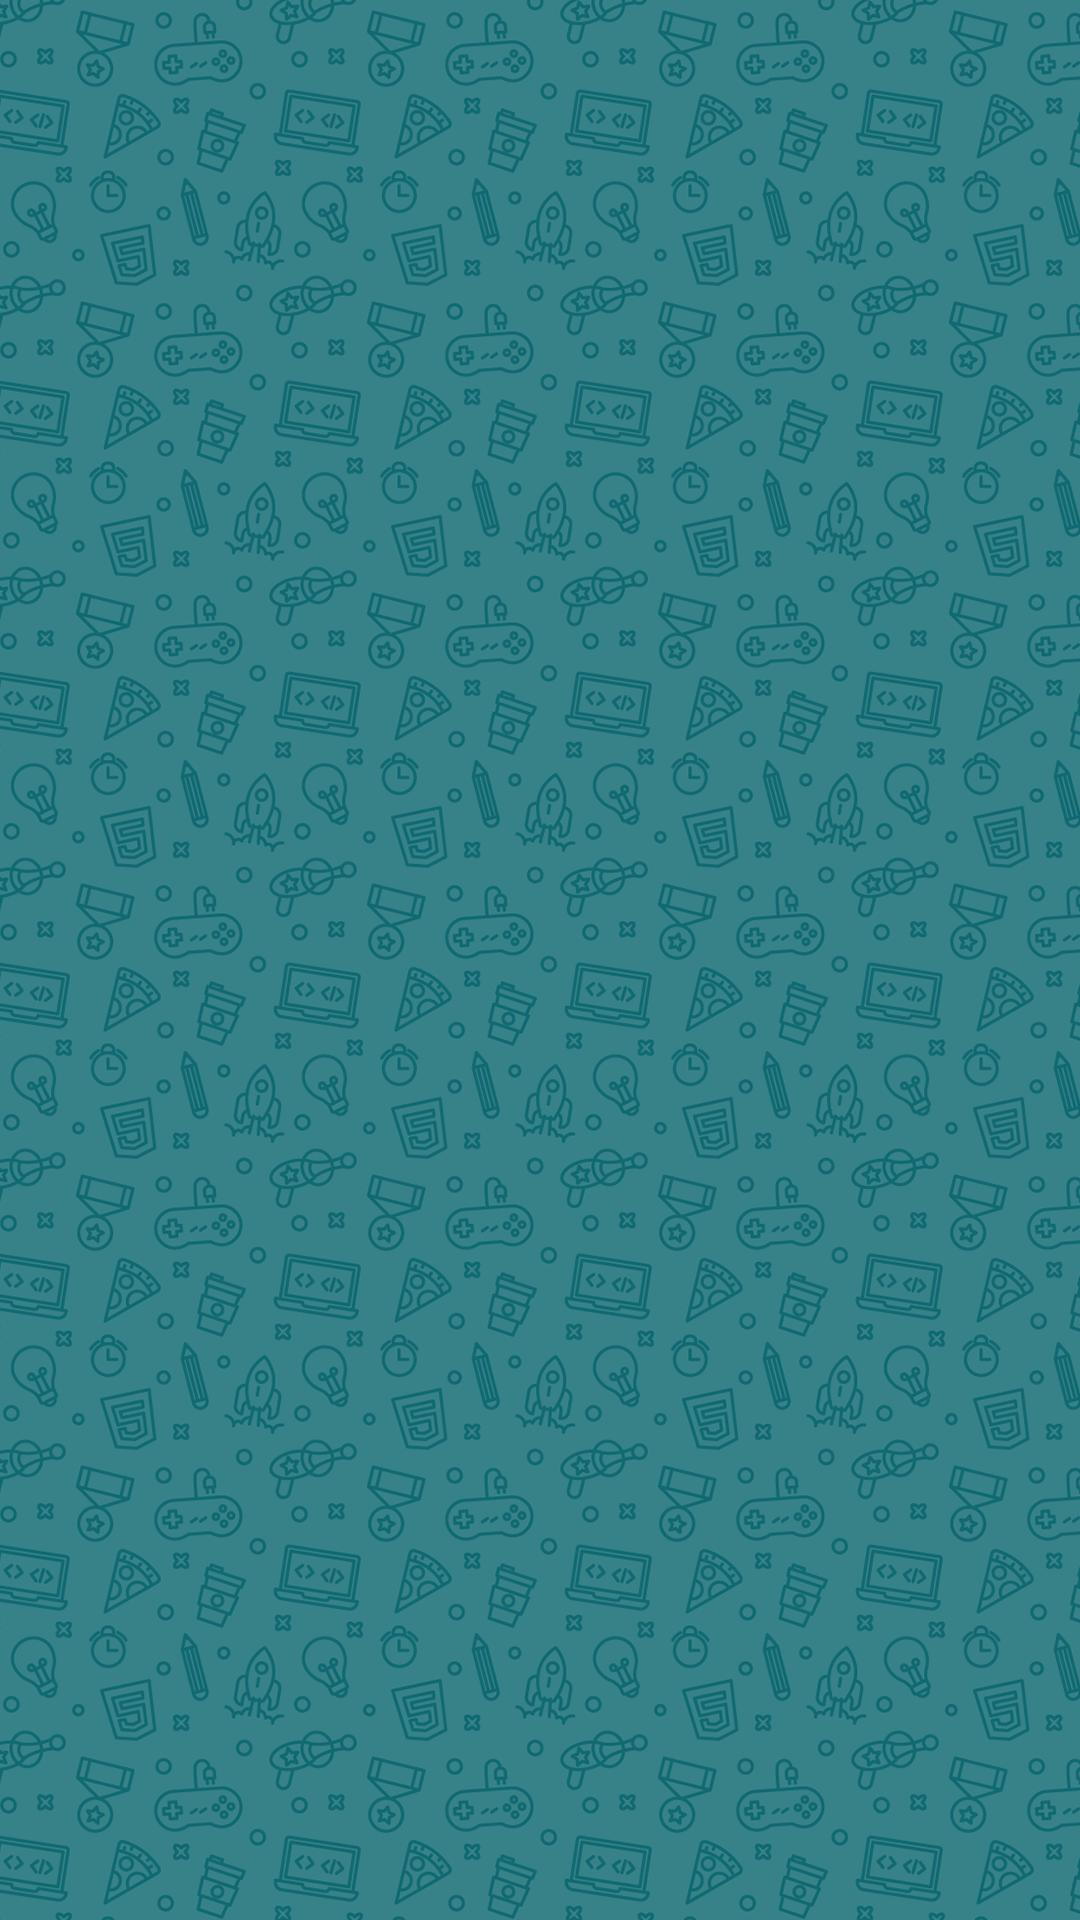 Pin De Aleksey Sidorenko Em Iphone Wallpapers Whatsapp Fundo